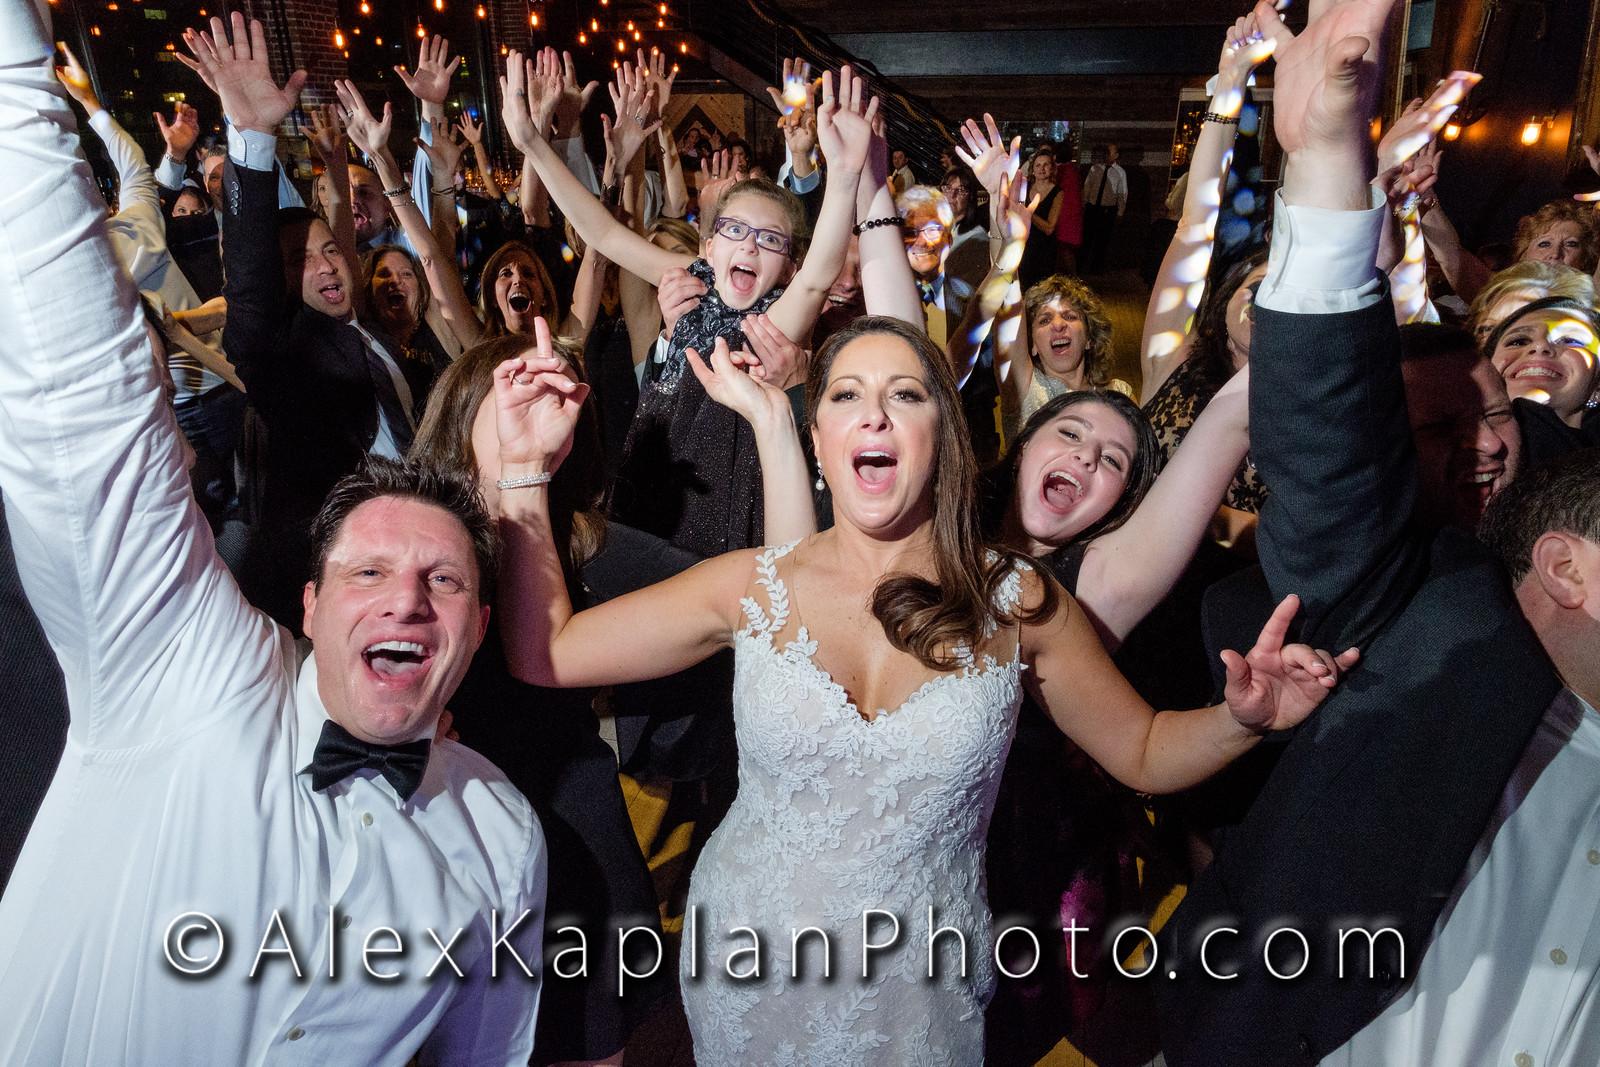 Wedding at Battello 502 Washington Blvd, Jersey City, NJ By Alex Kaplan Photo Video